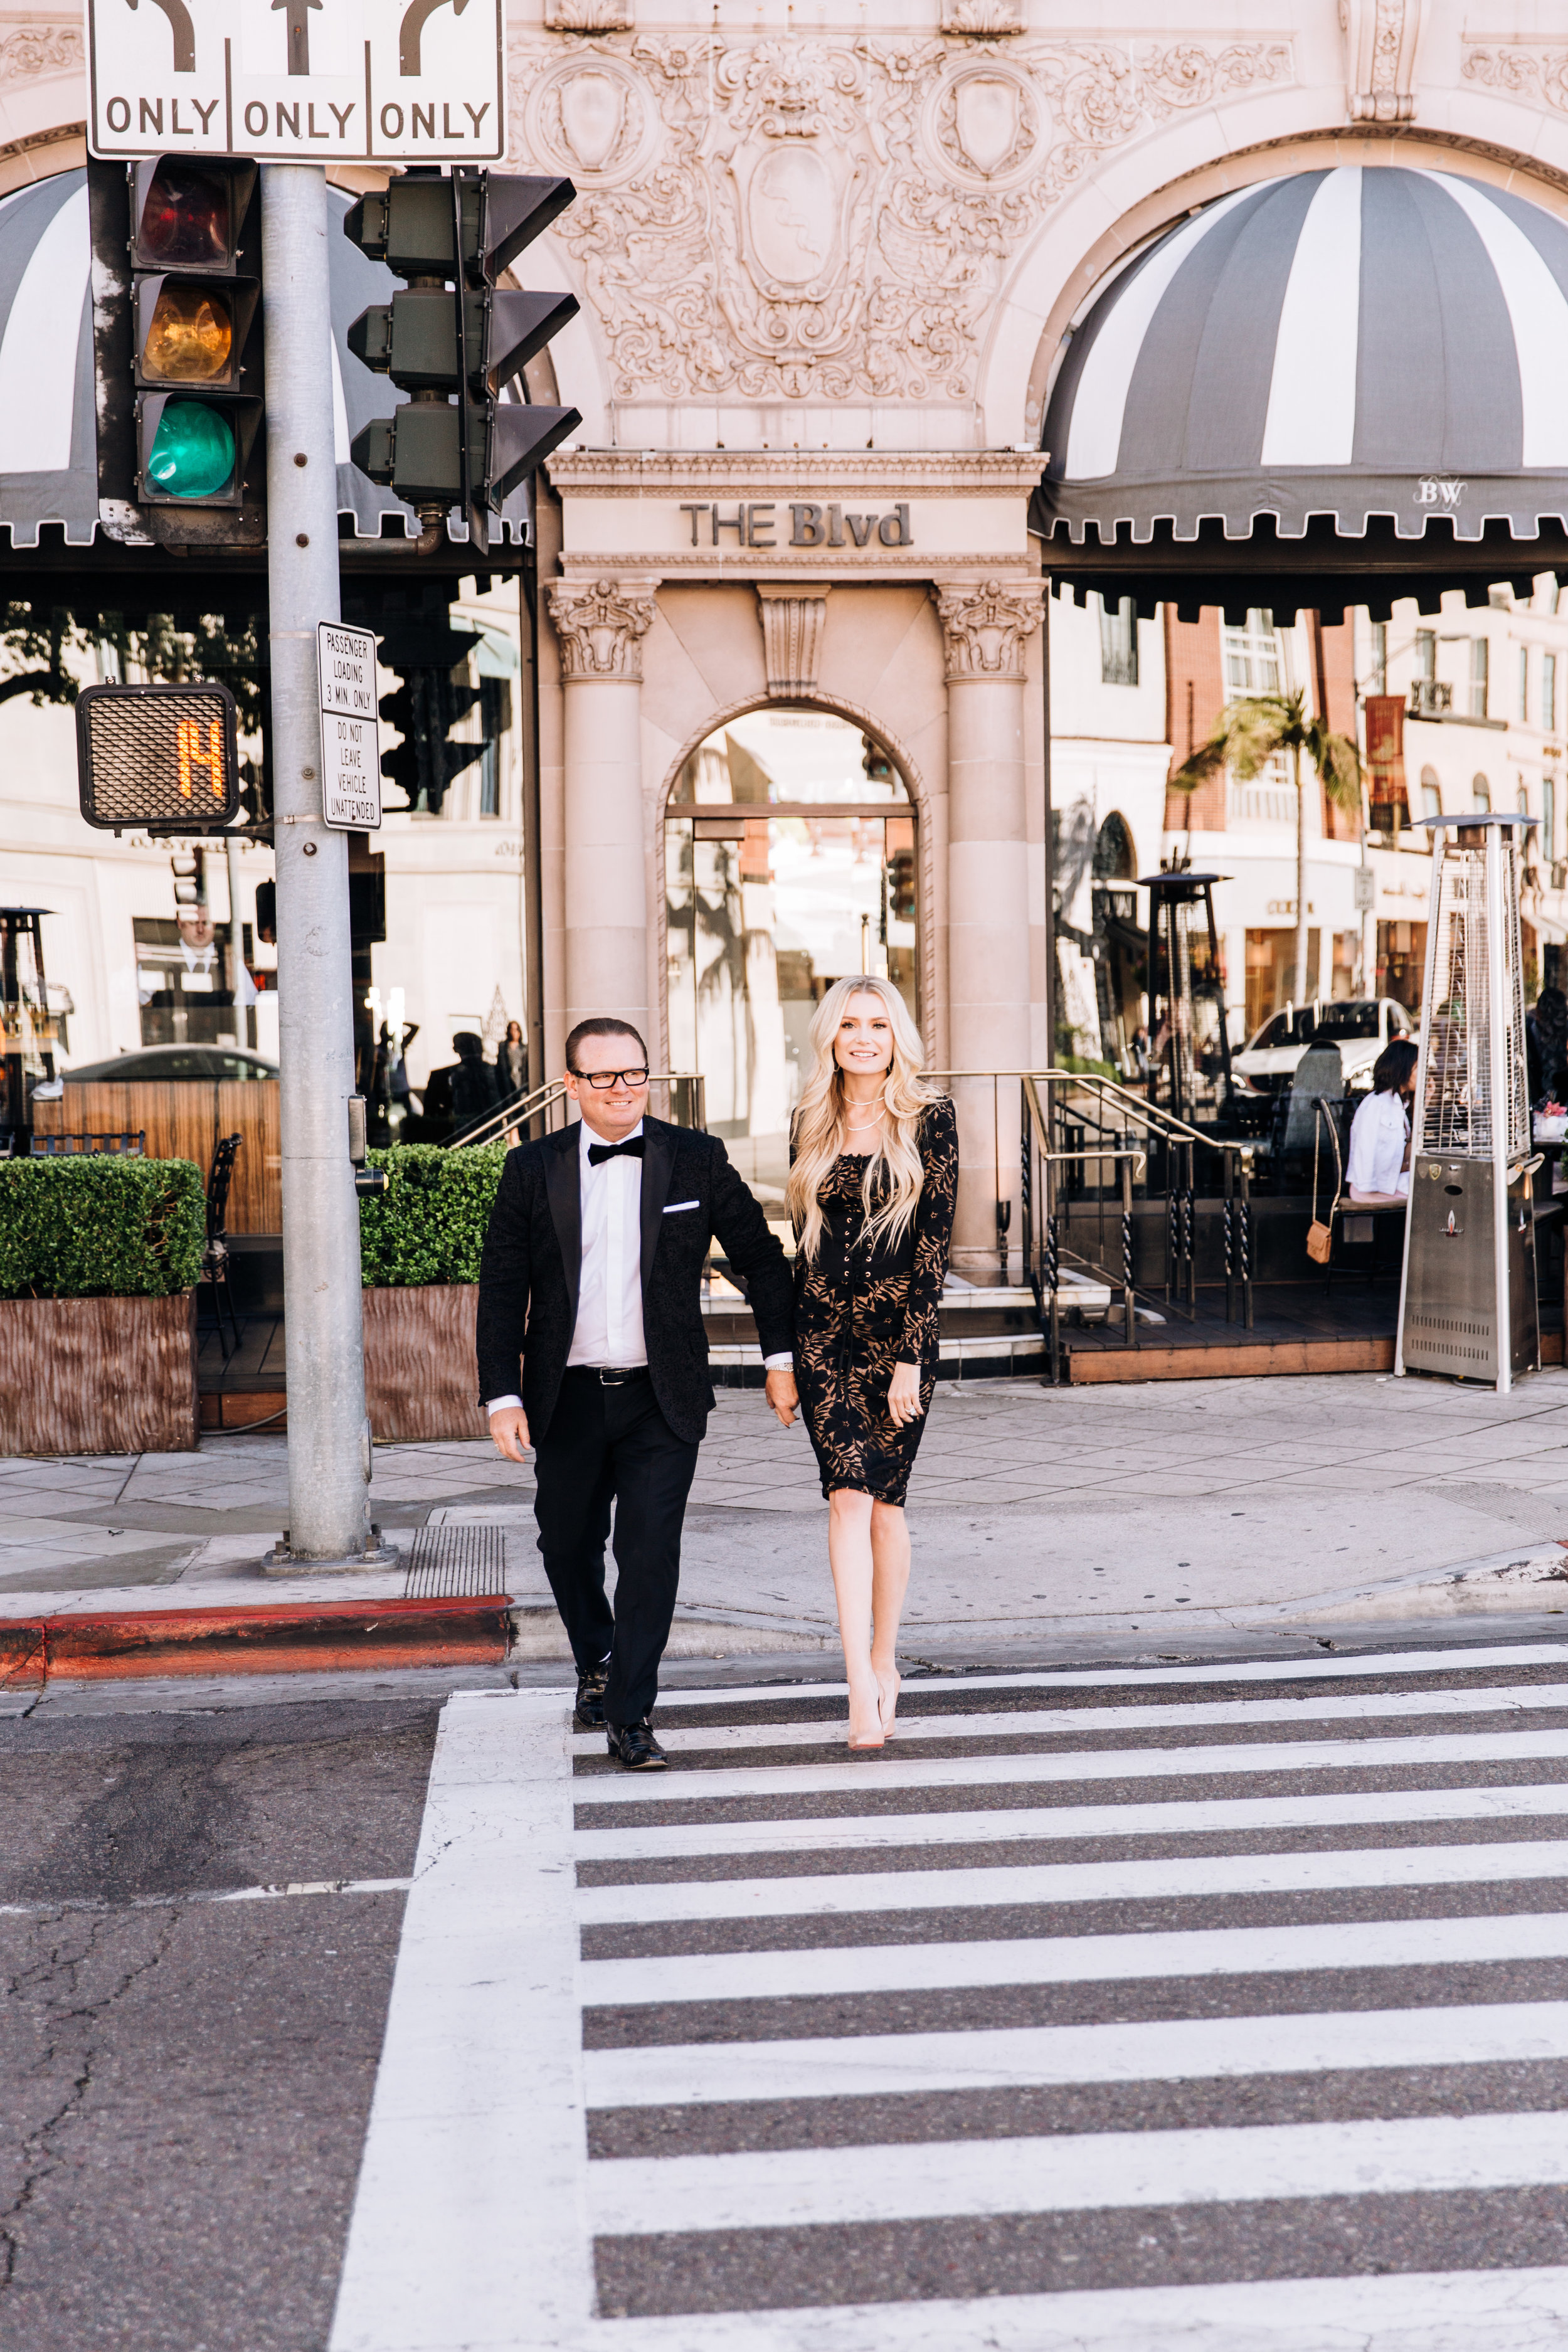 KaraNixonWeddings-BeverlyHills-RodeoDr-Engagement-14.jpg